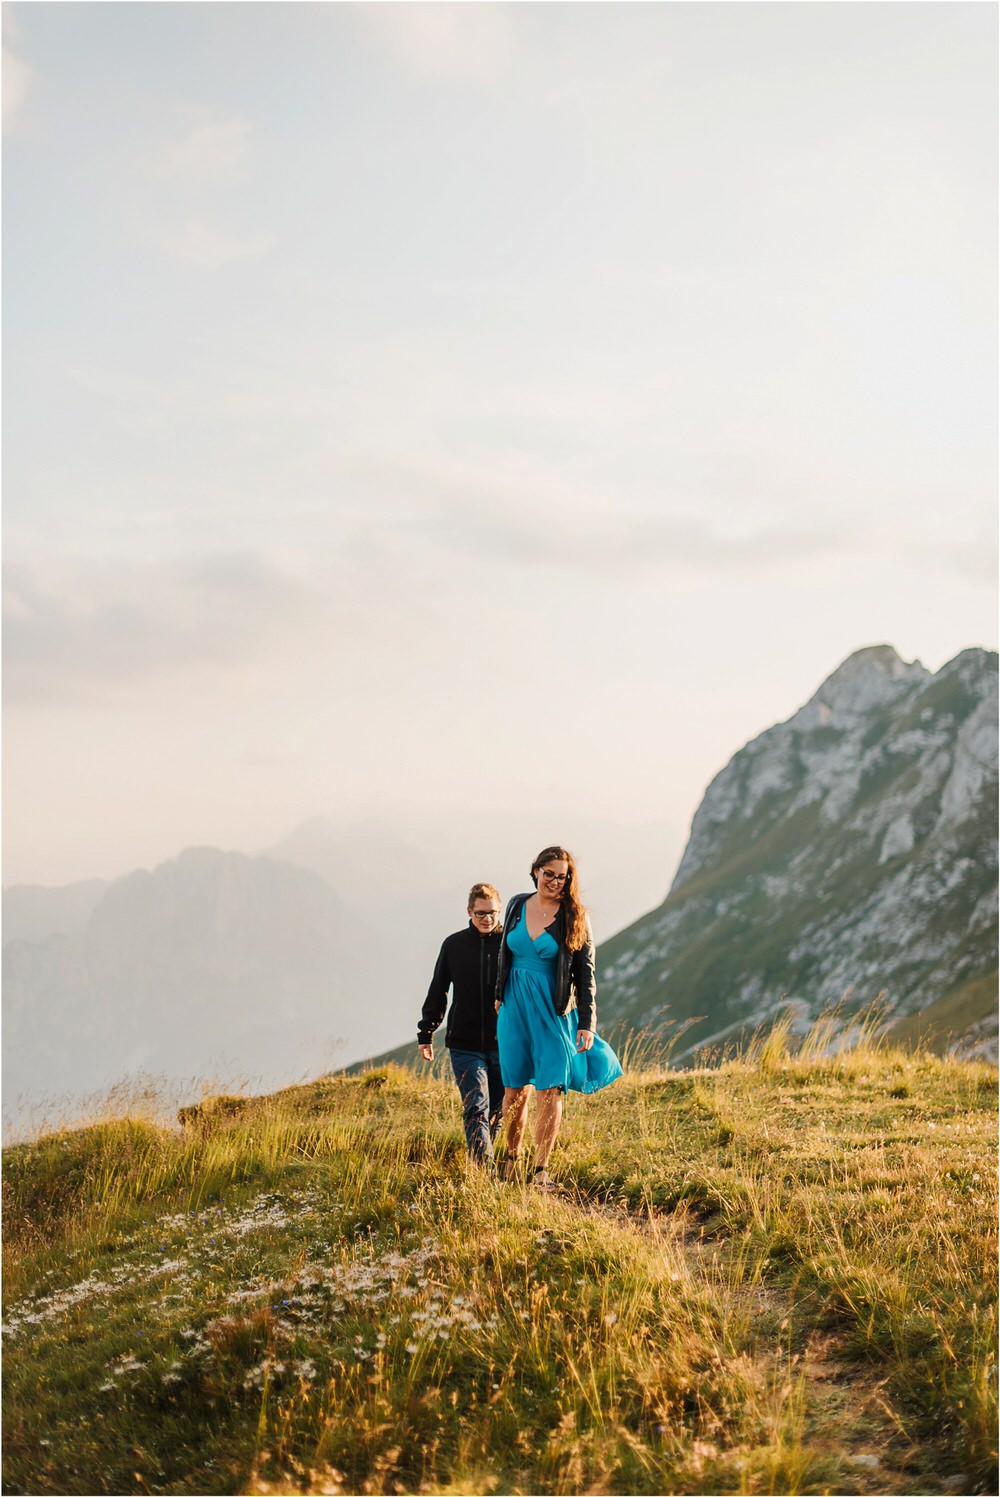 tuscany wedding photographer greece croatia dubrovnik vjencanje hochzeit wedding photography photos romantic engagement nika grega 0101.jpg